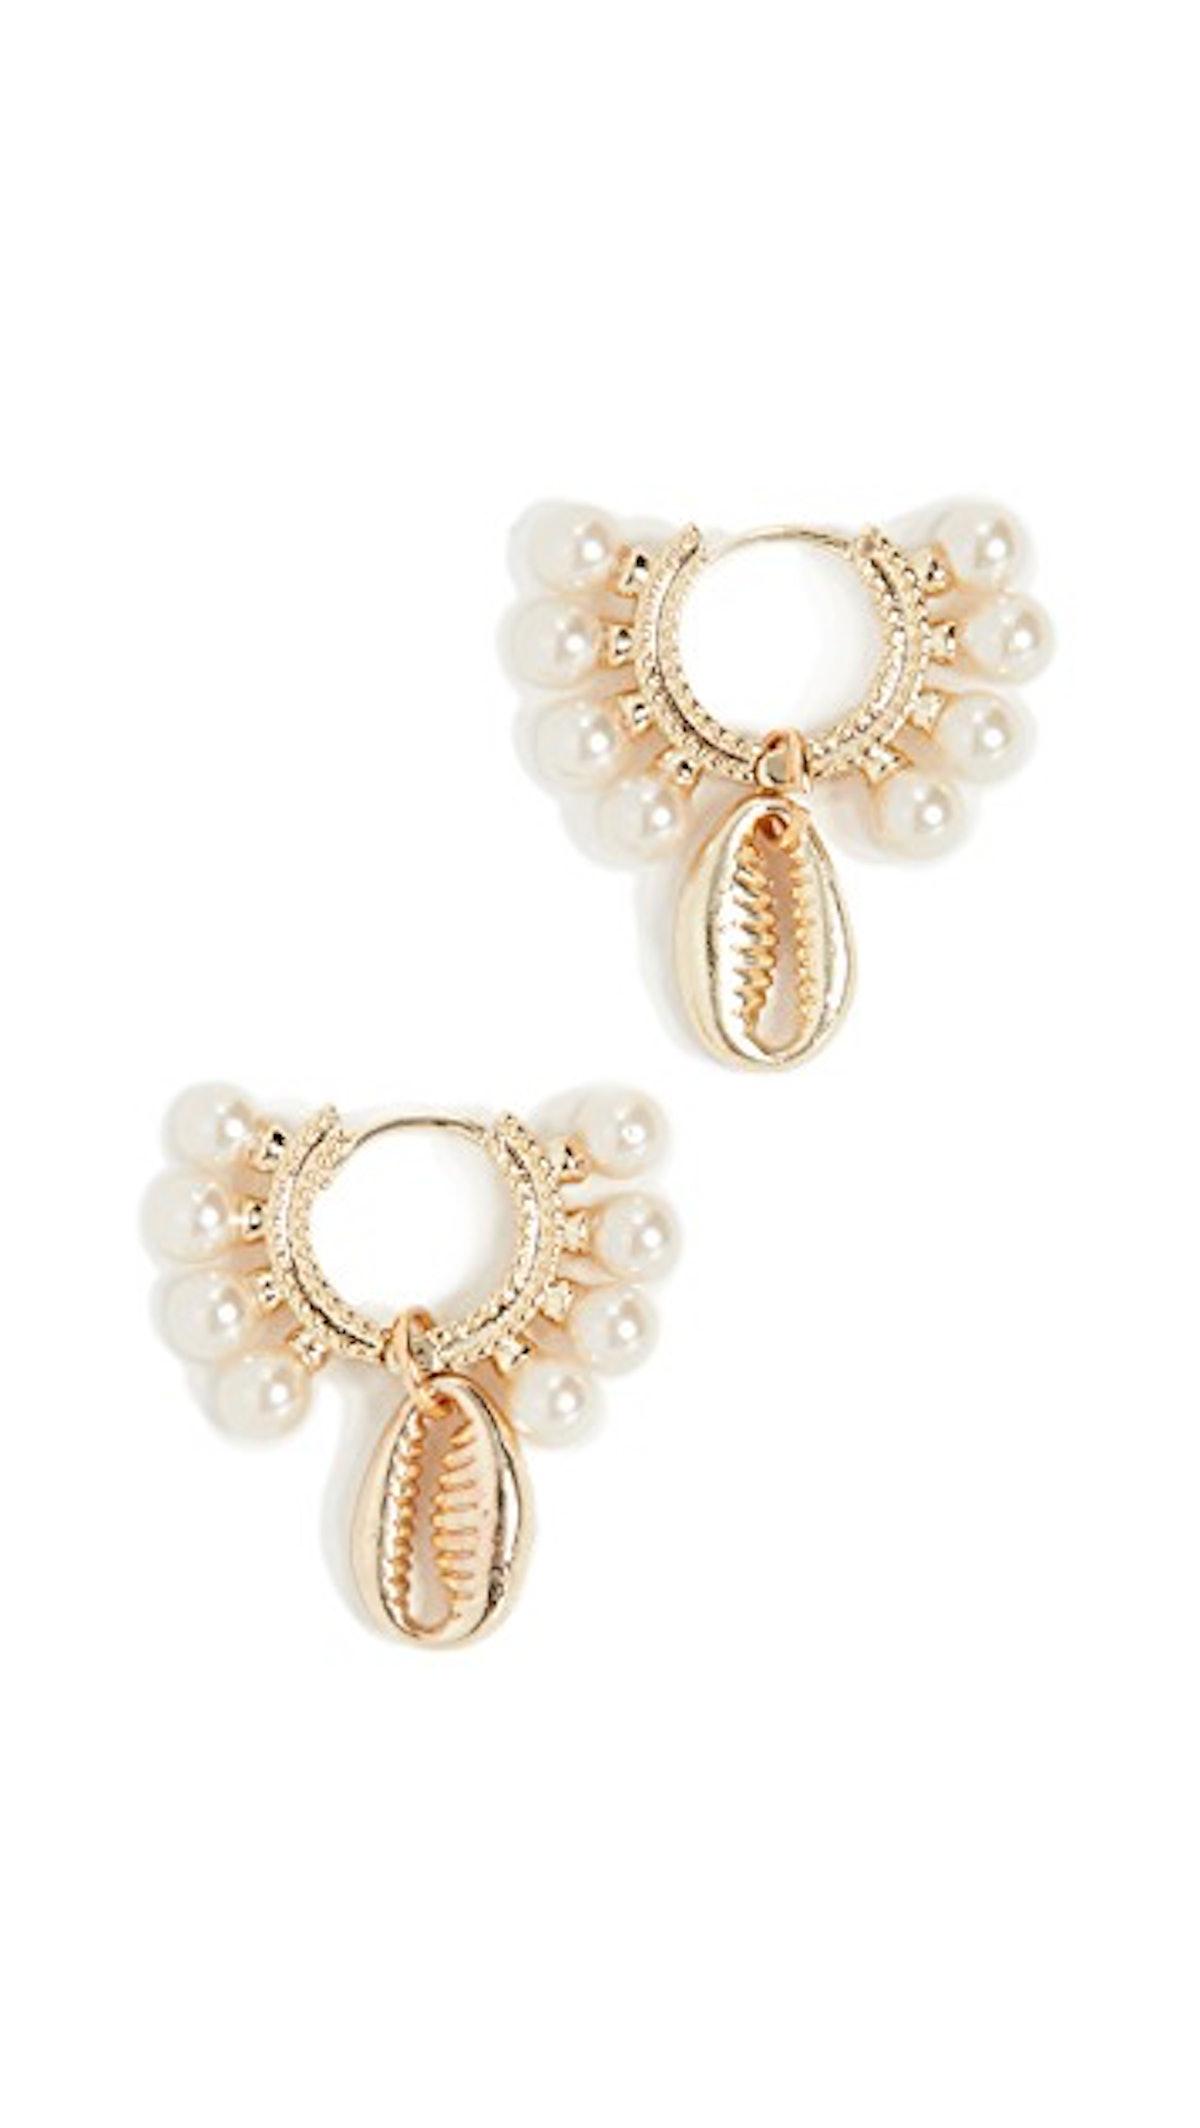 Shashi Lola Baltic Huggie Earrings